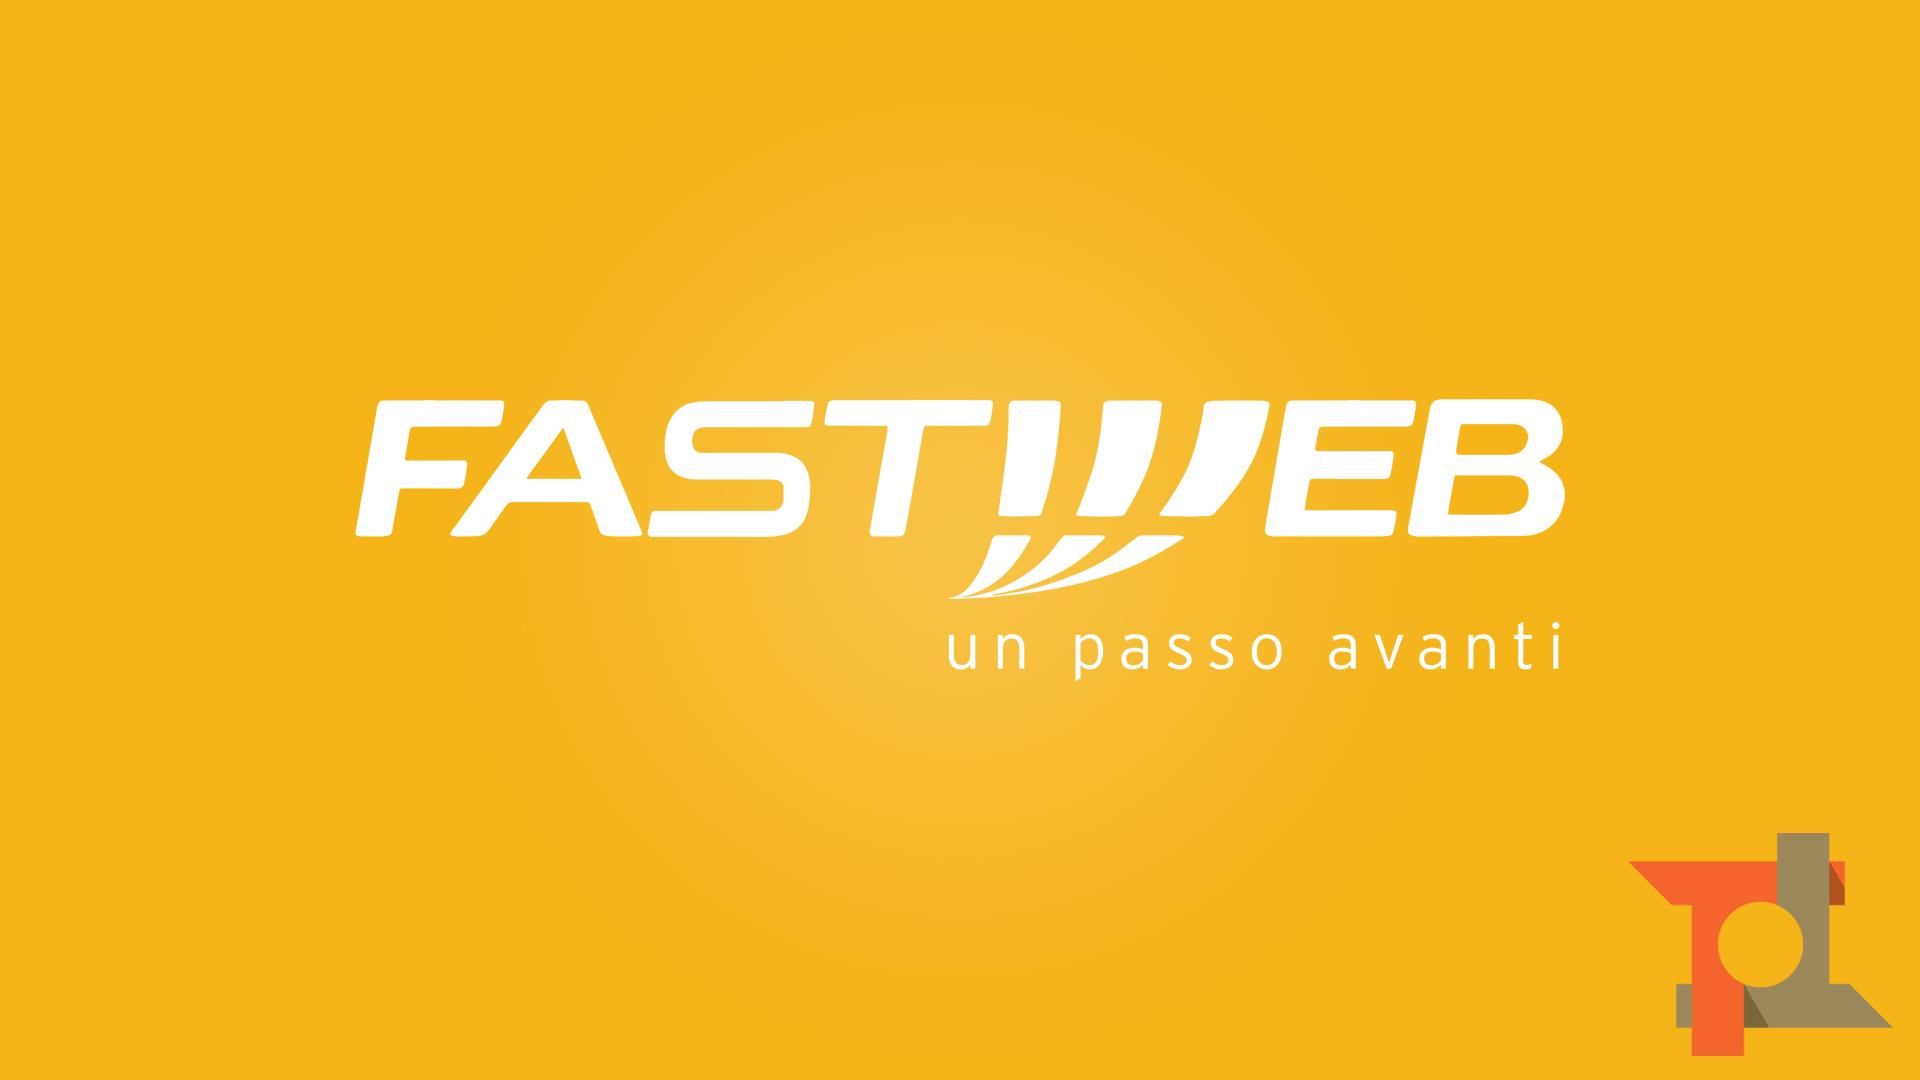 Migliori offerte fibra e ADSL di TIM, Vodafone, Fastweb, WINDTRE e Tiscali 2